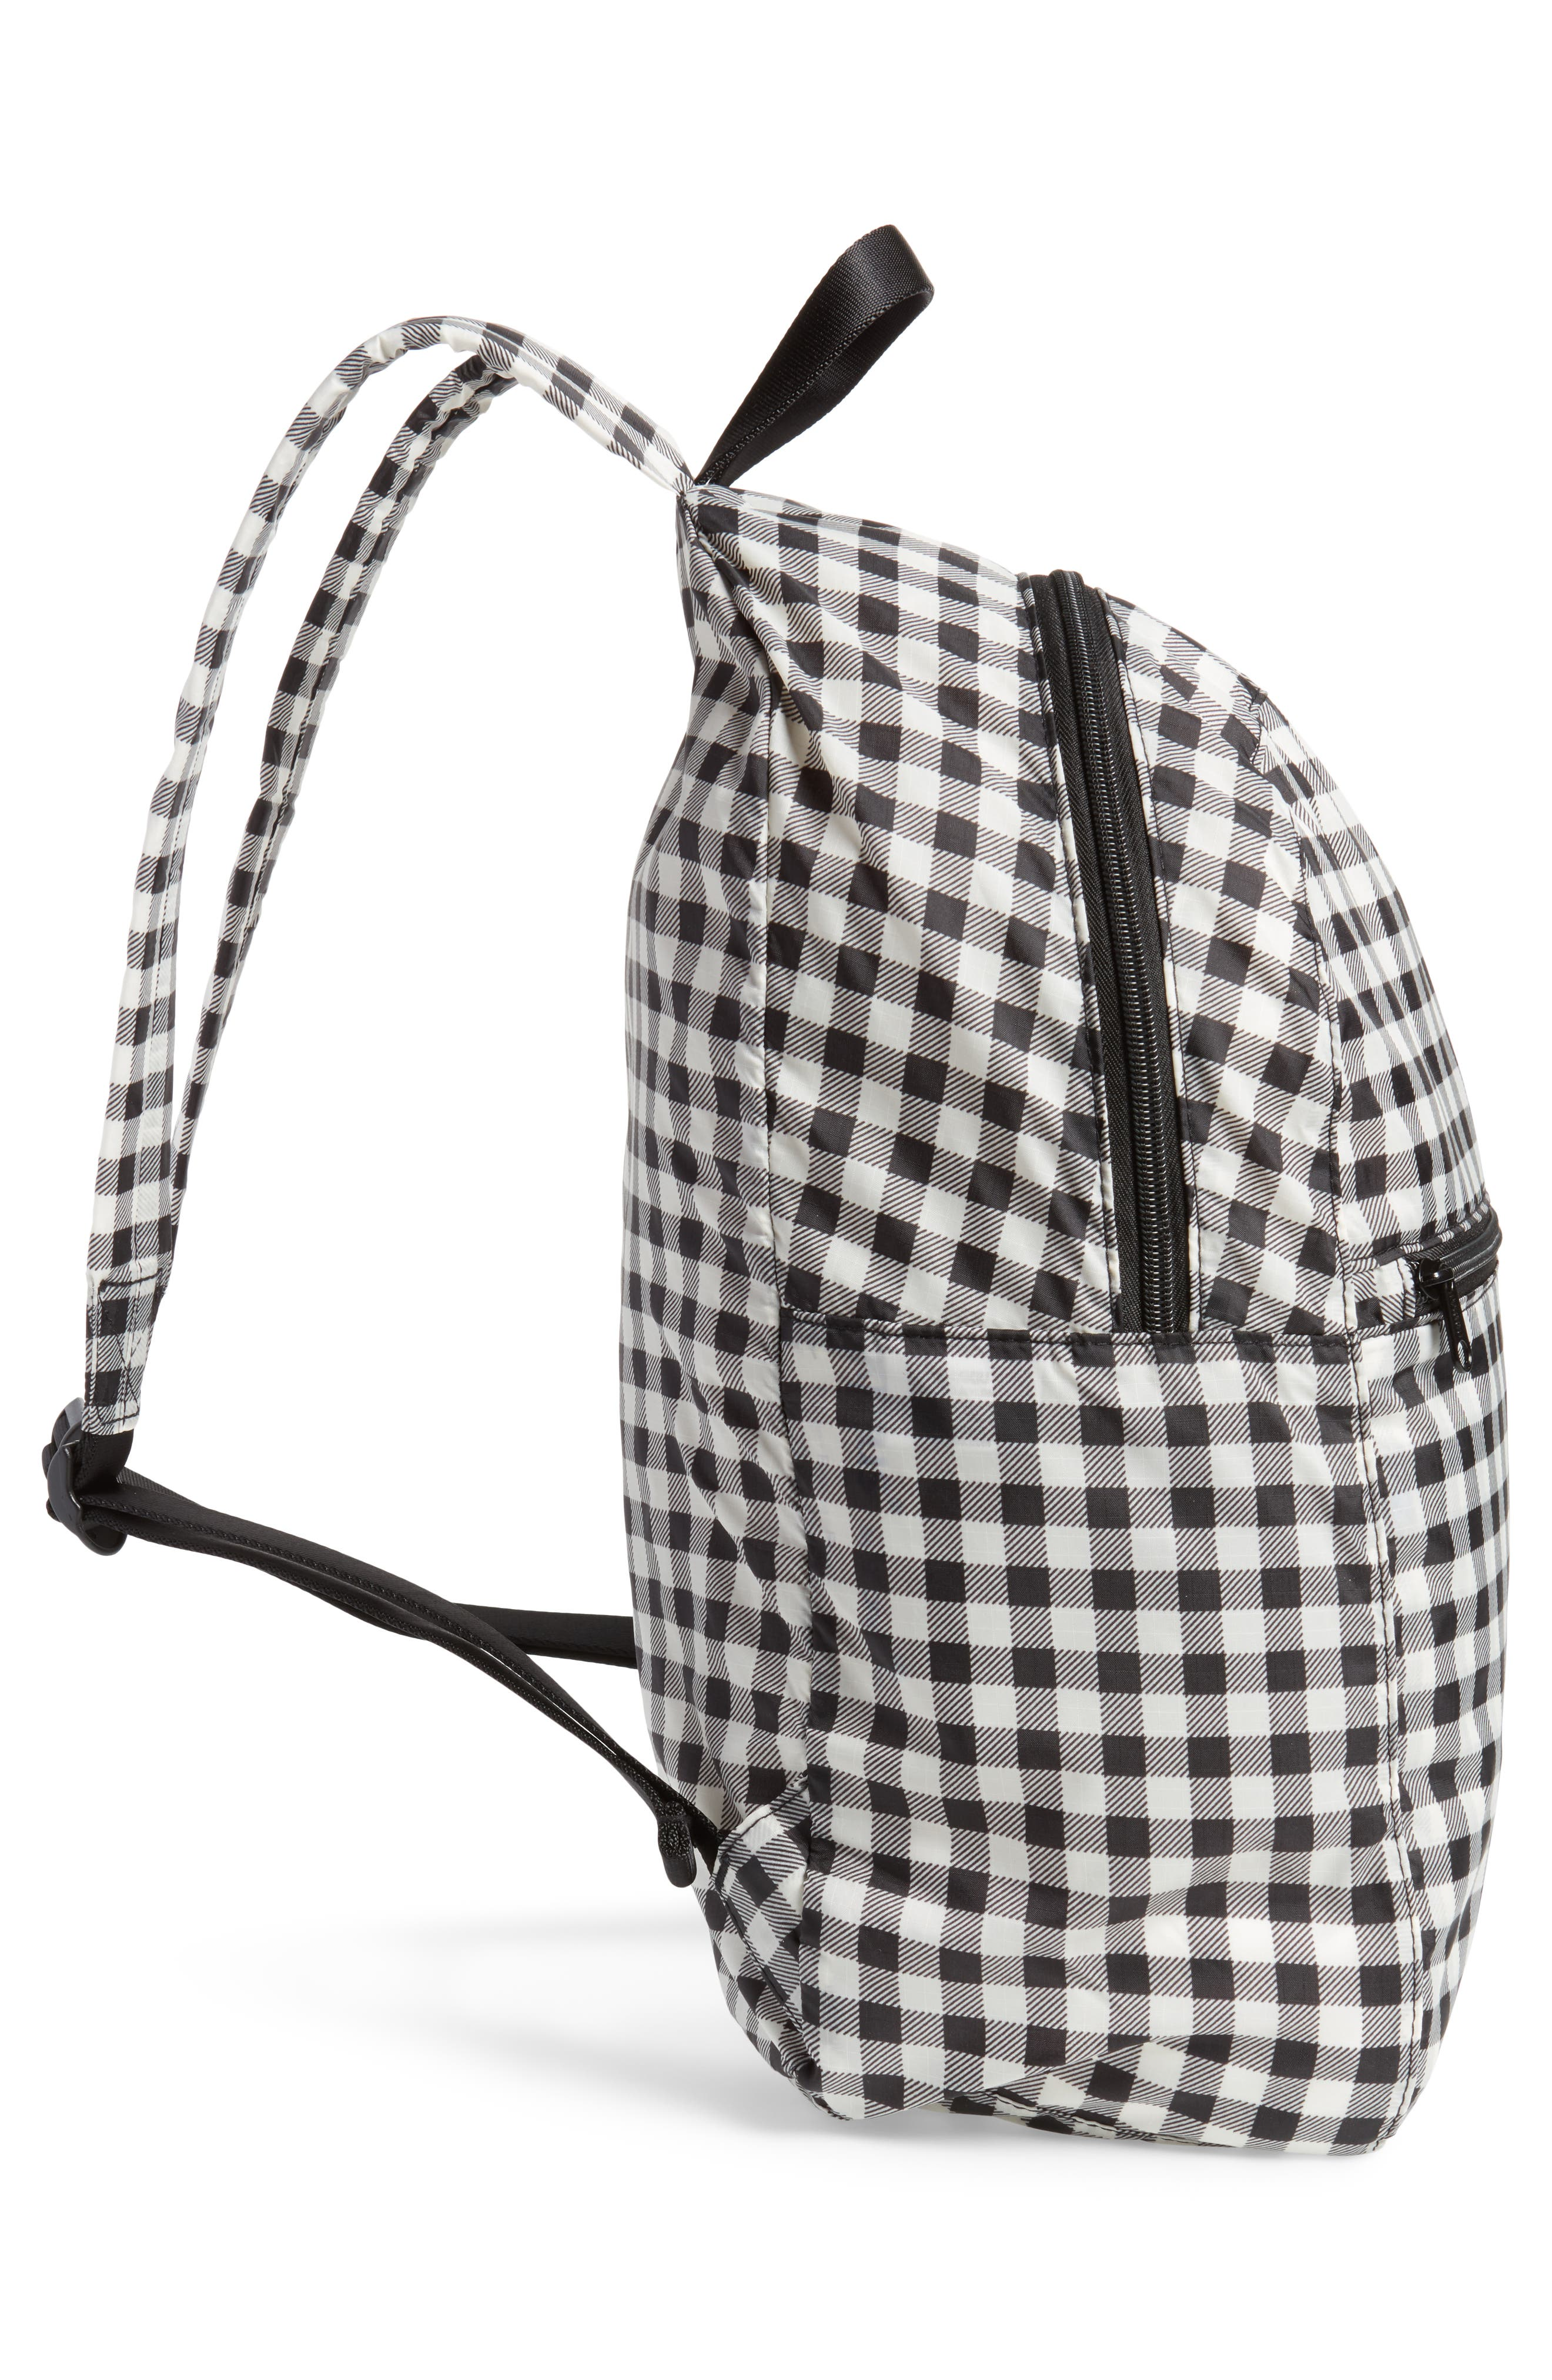 Ripstop Nylon Backpack,                             Alternate thumbnail 5, color,                             006